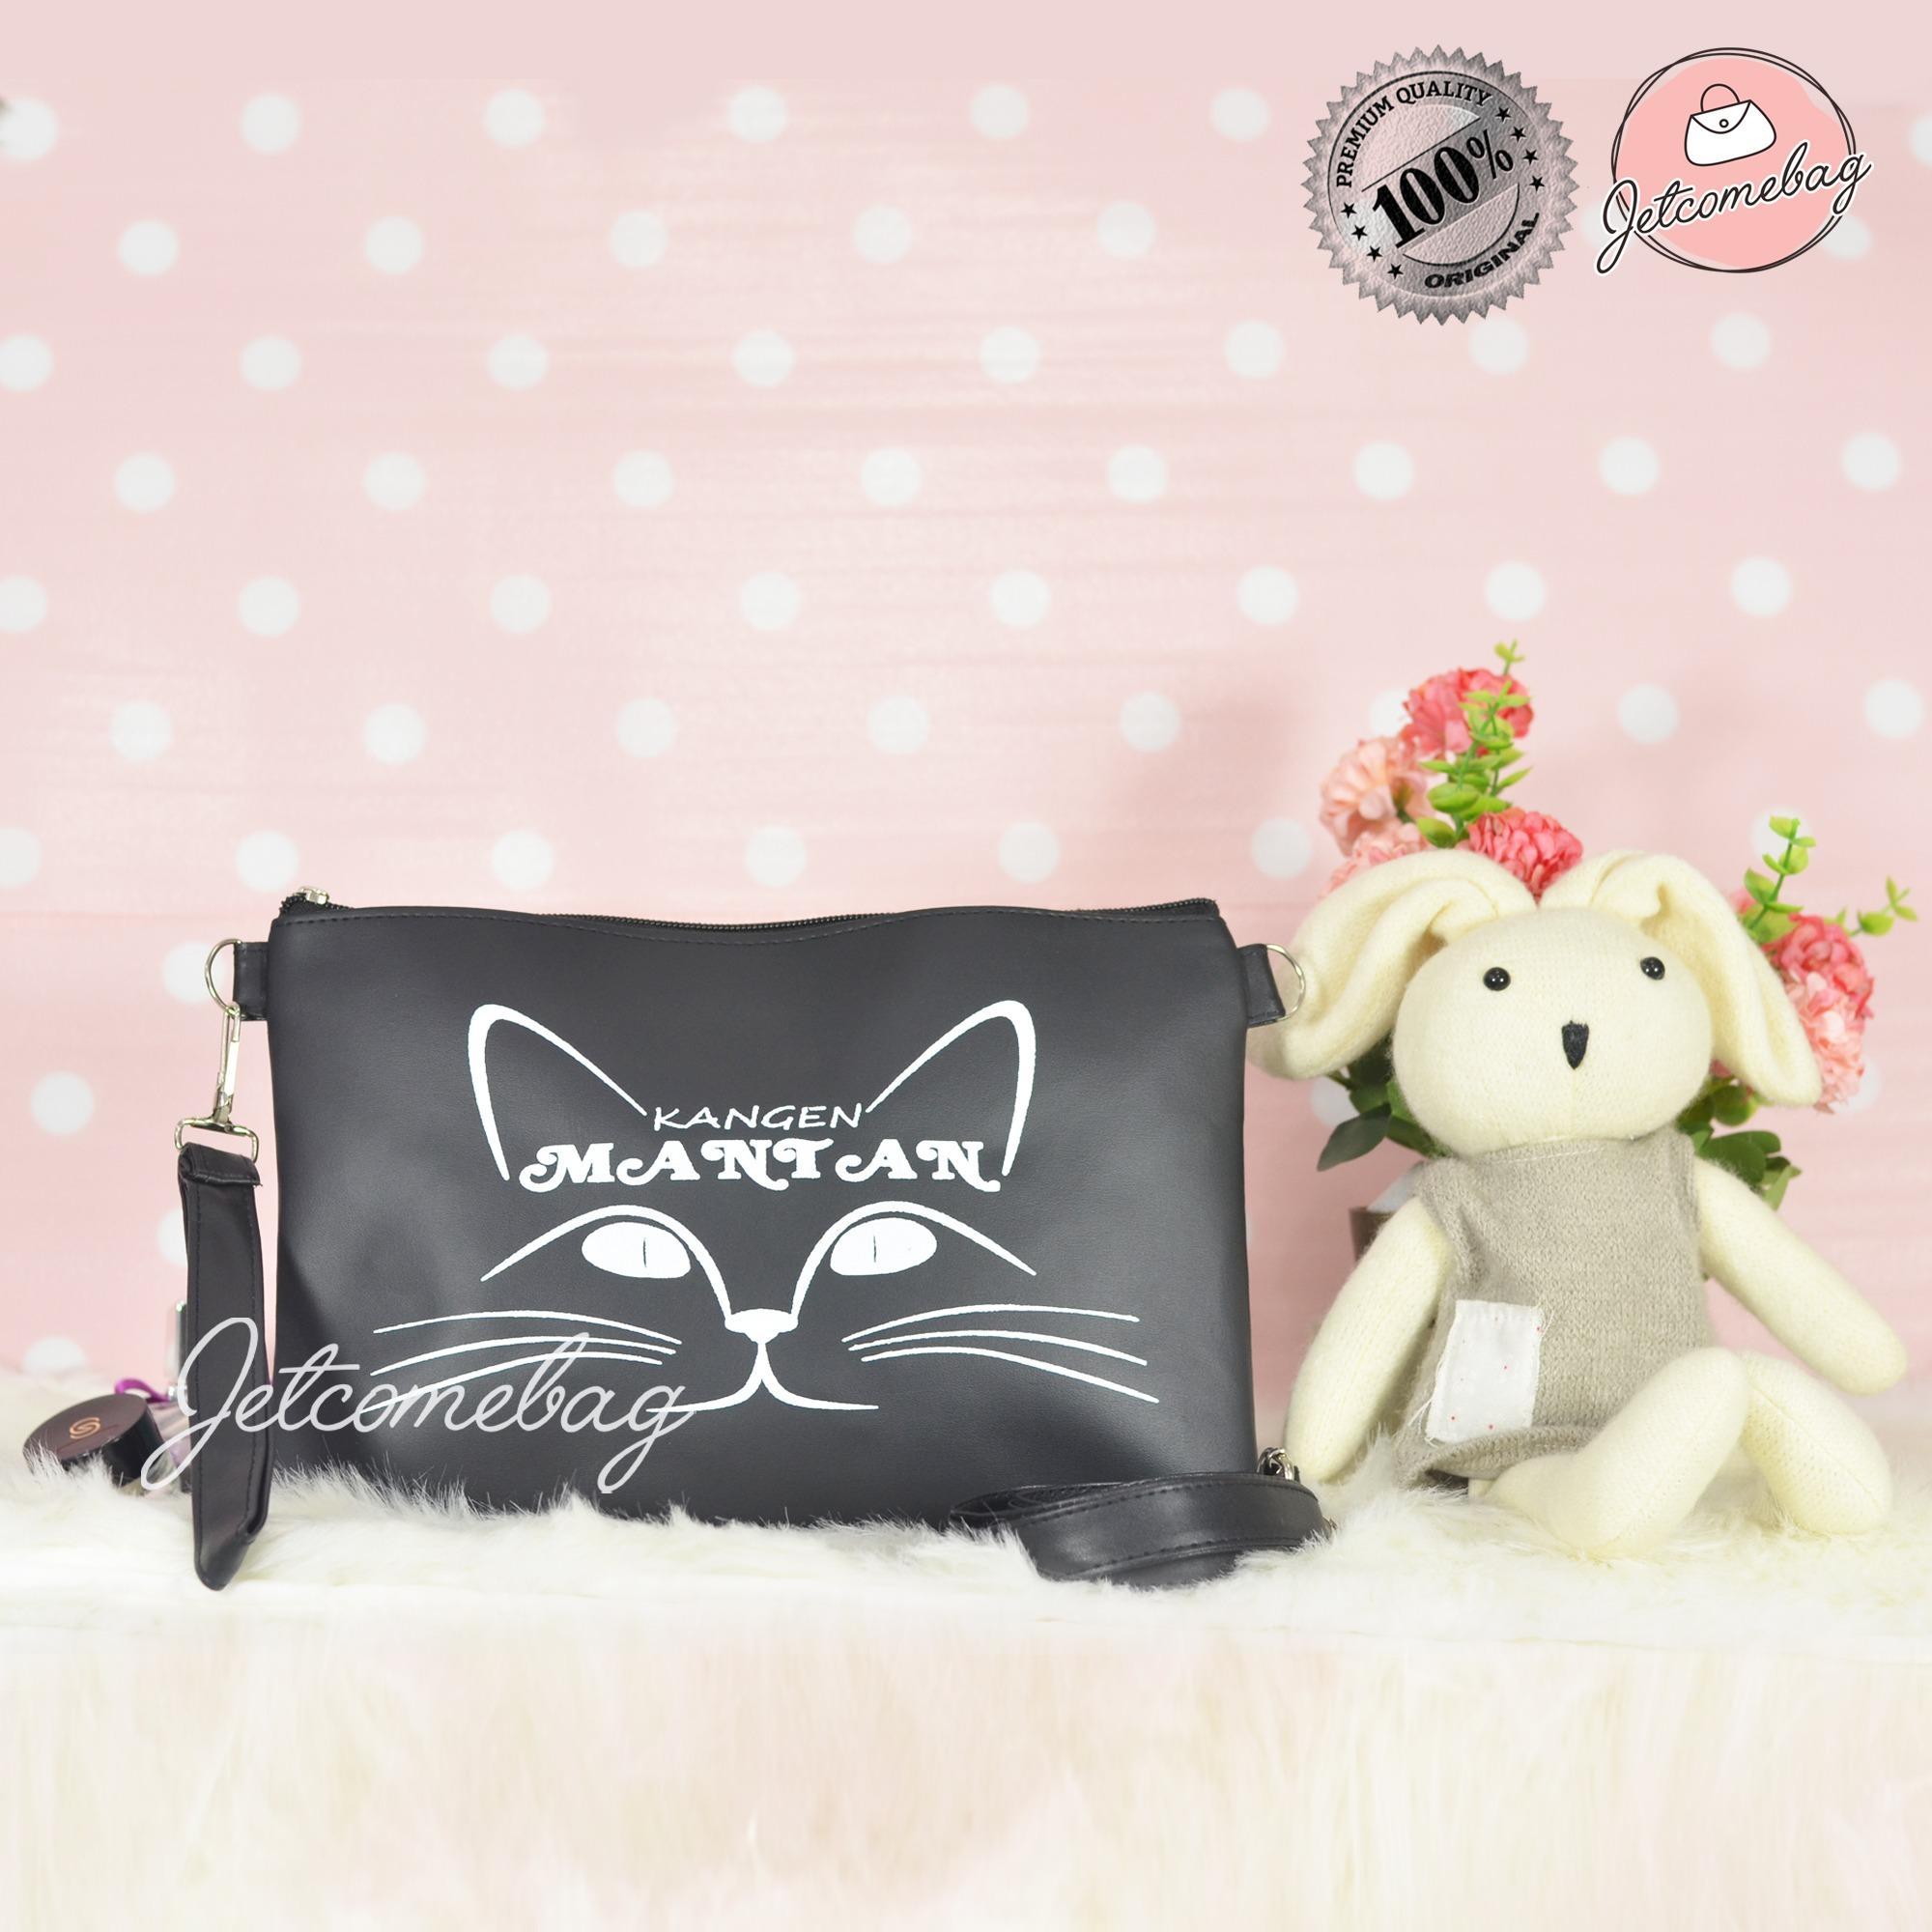 Tas Wanita Termurah Clutch Bag Kangen Mantan JETCOMEBAG - Black Best Seller